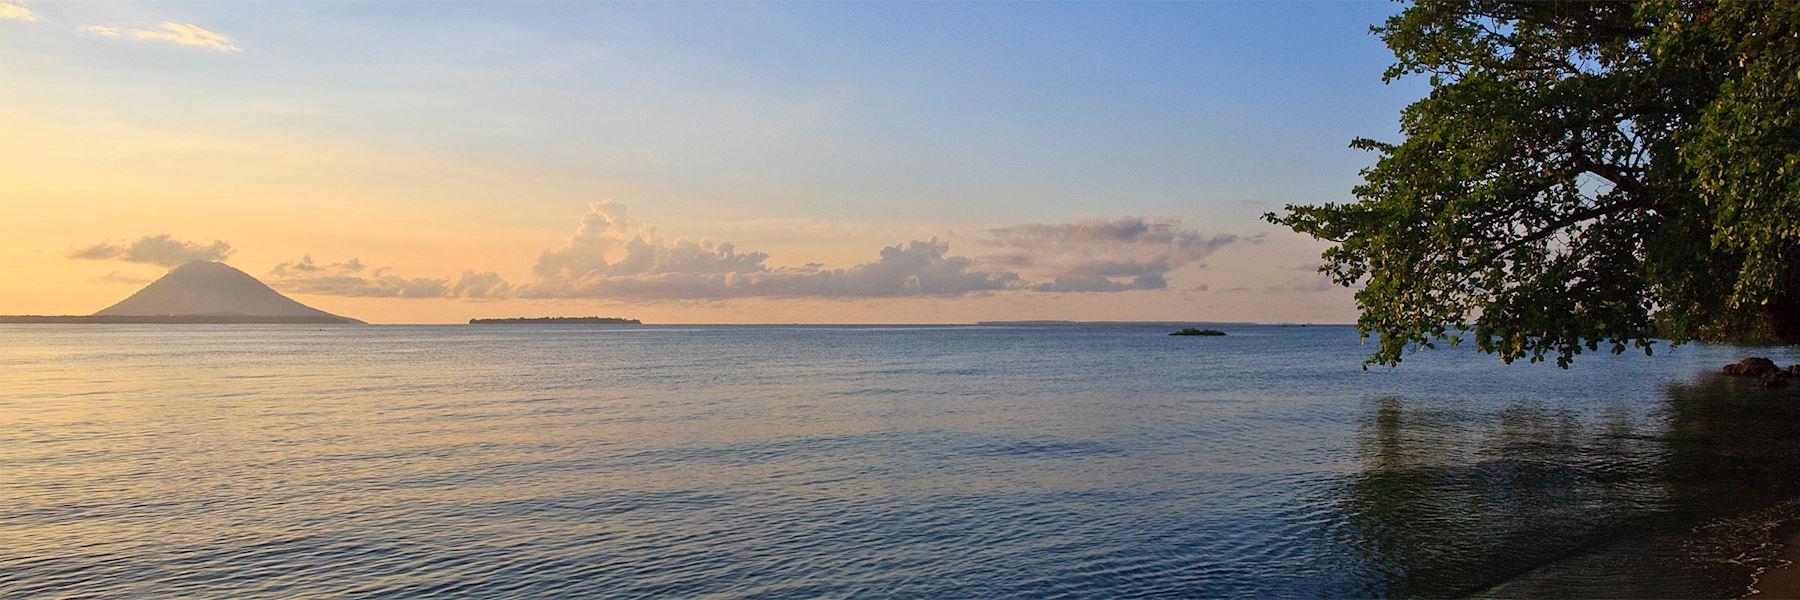 Visit Bunaken National Marine Park, Indonesia